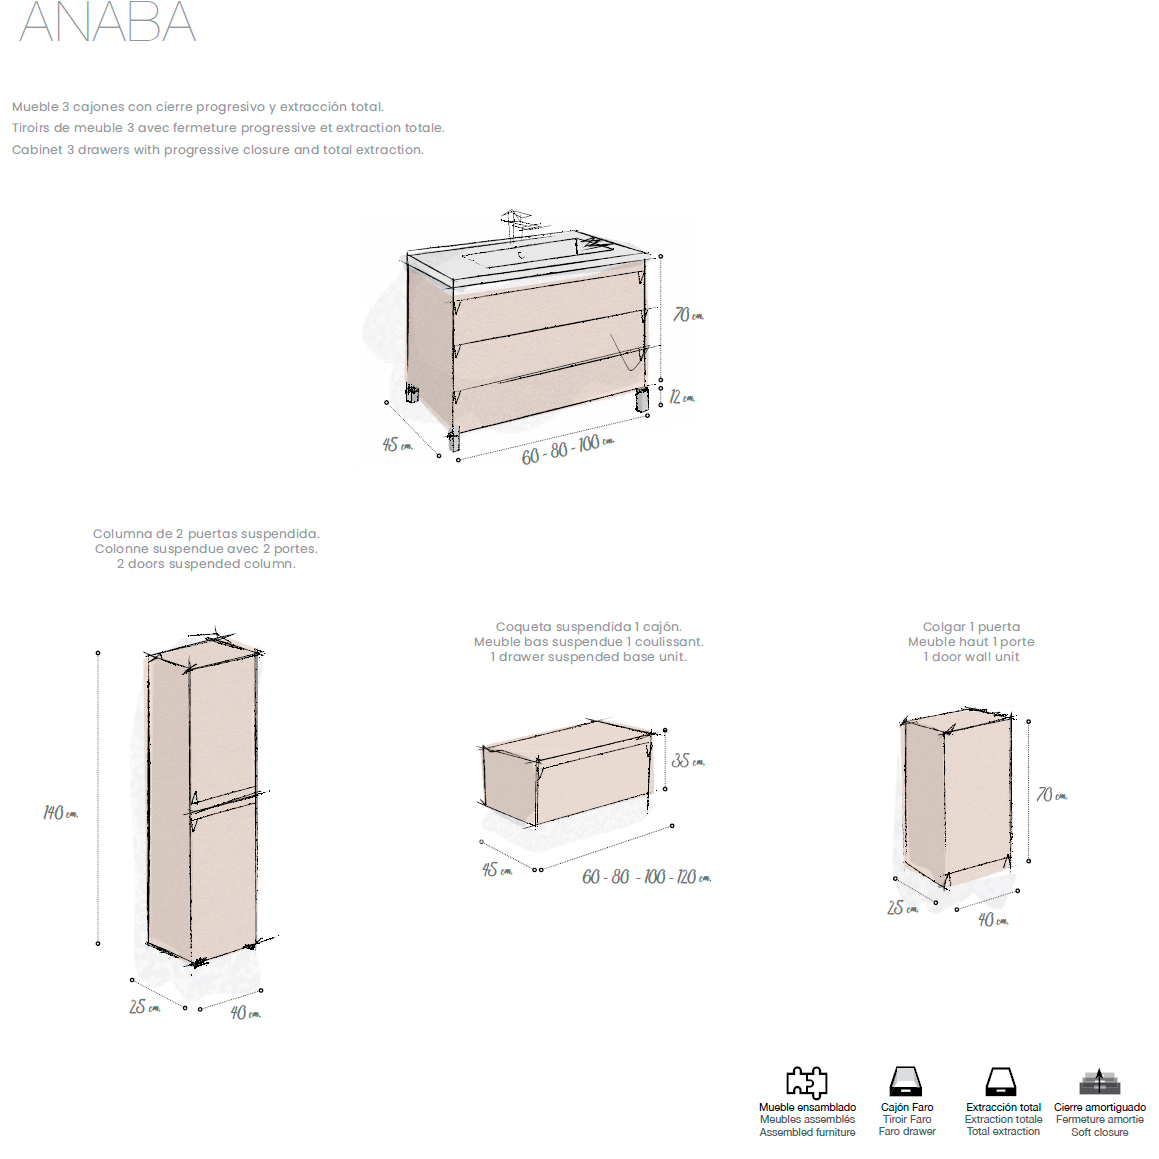 tecnico-anaba